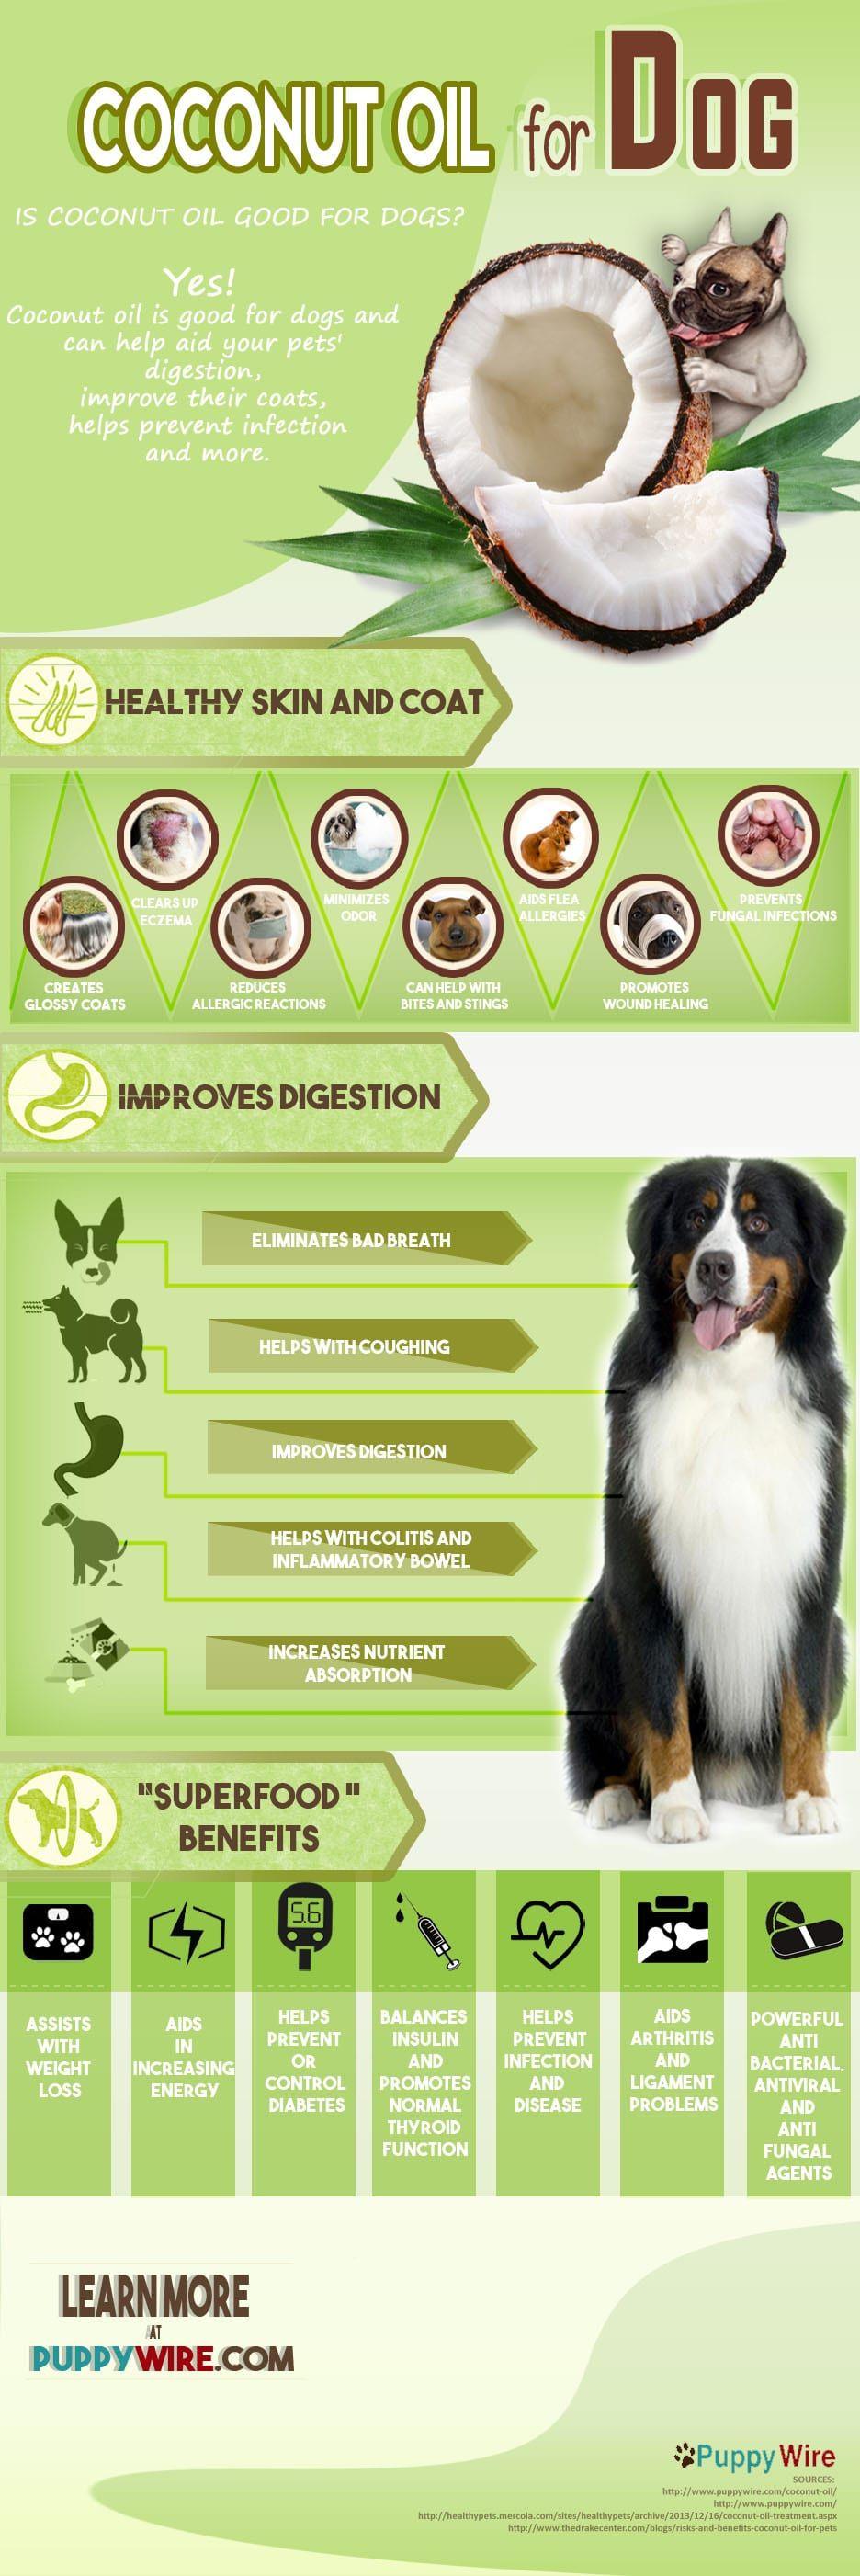 Best Coconut Oil For Dogs Guide Top 5 Comparison Pets Oils